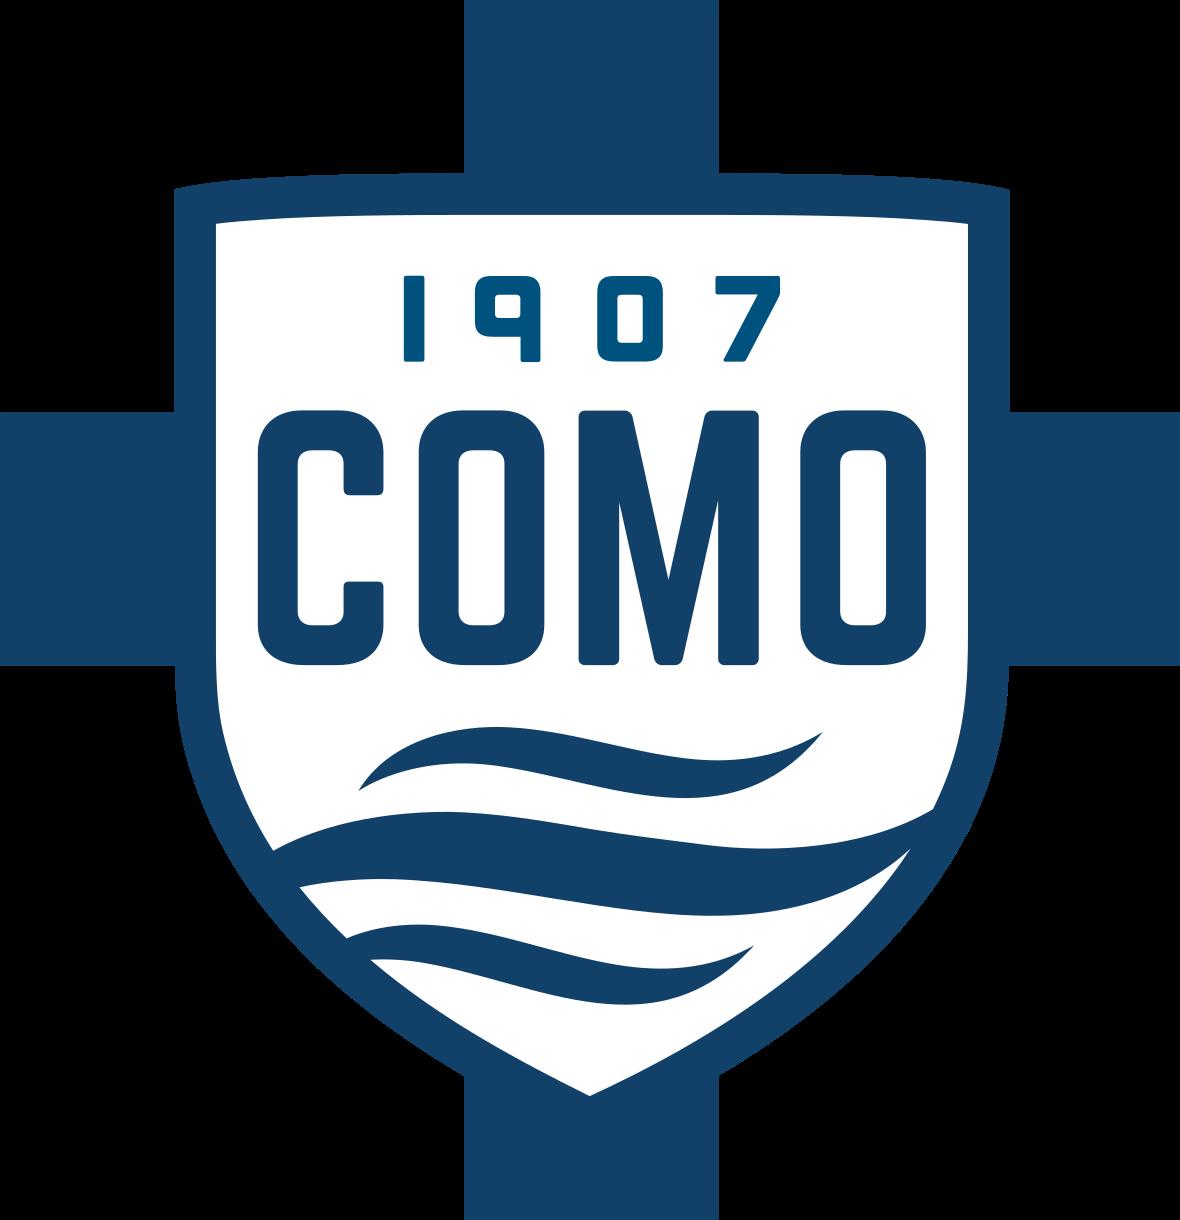 Como 1907 association football club in Italy